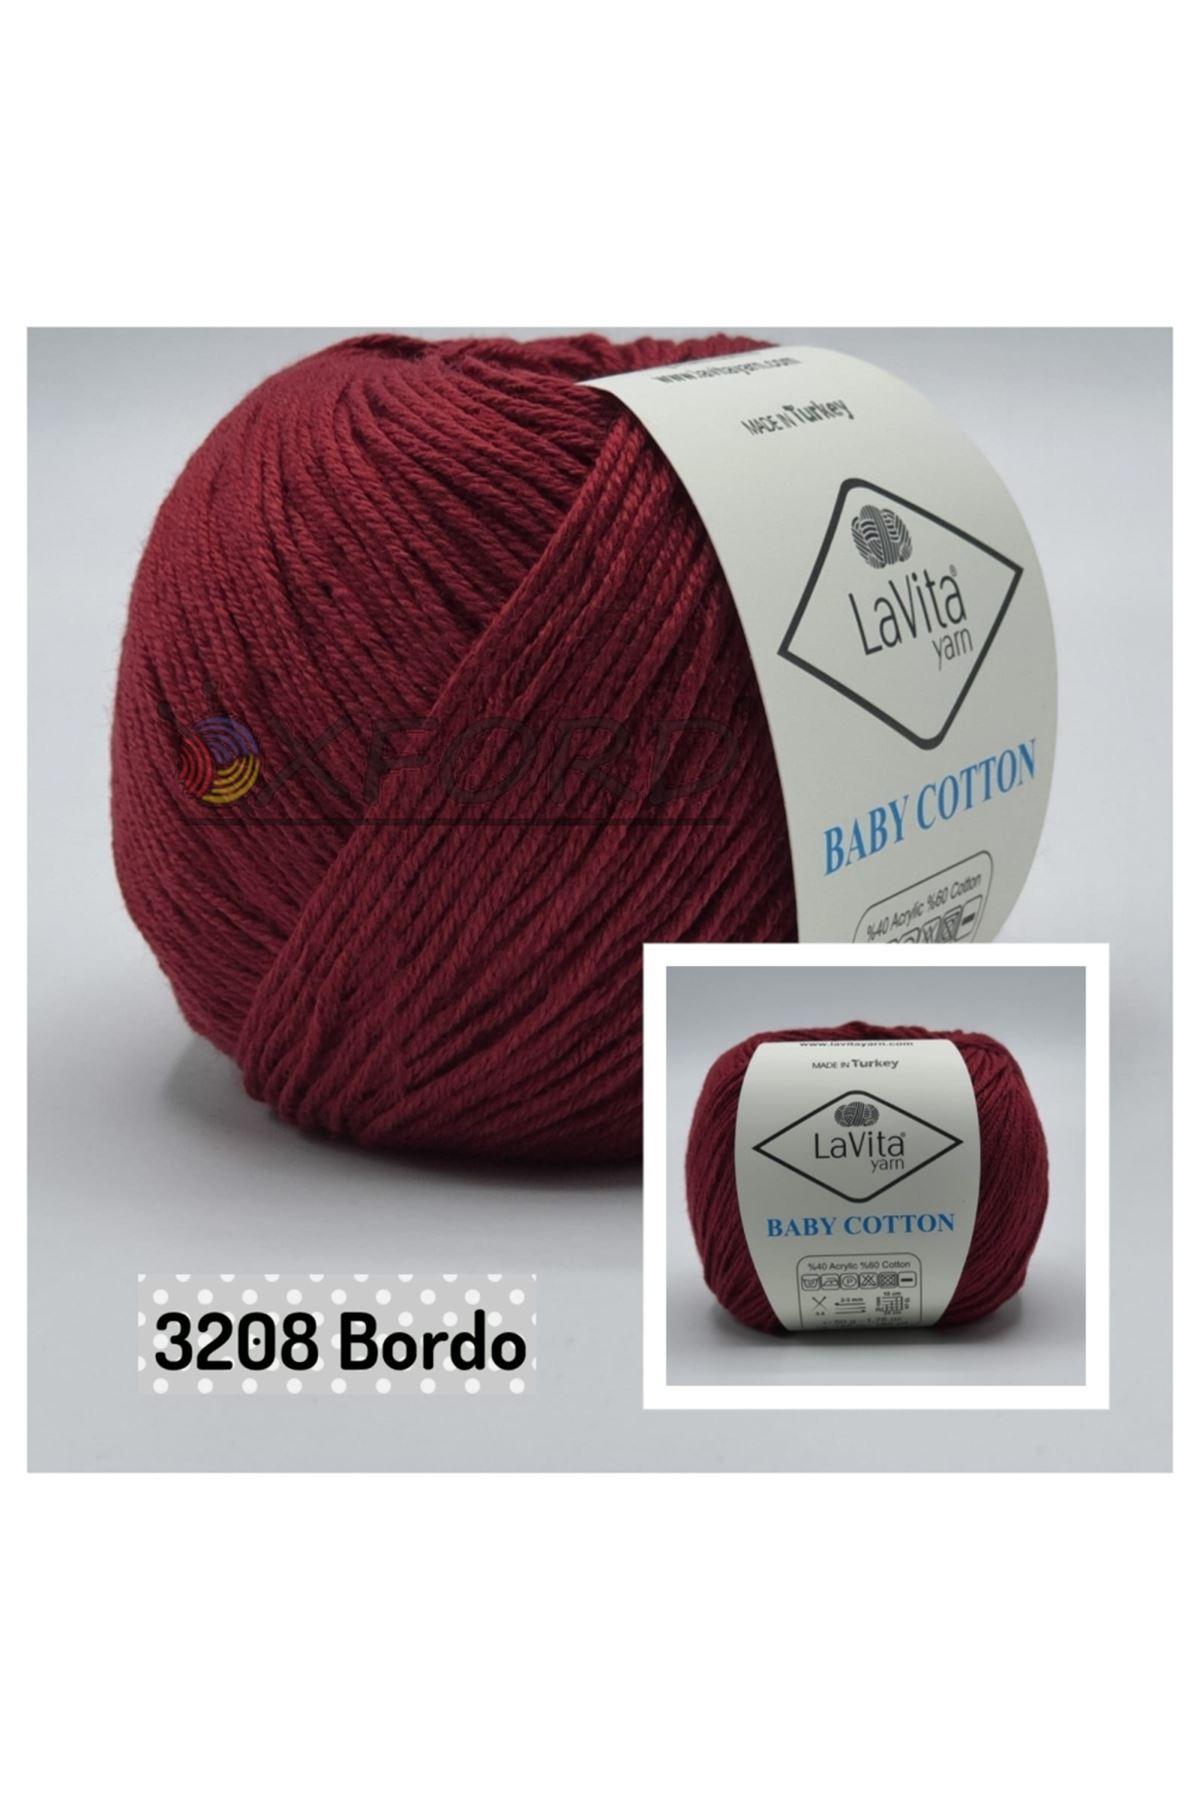 Lavita Baby Cotton 3208 Bordo